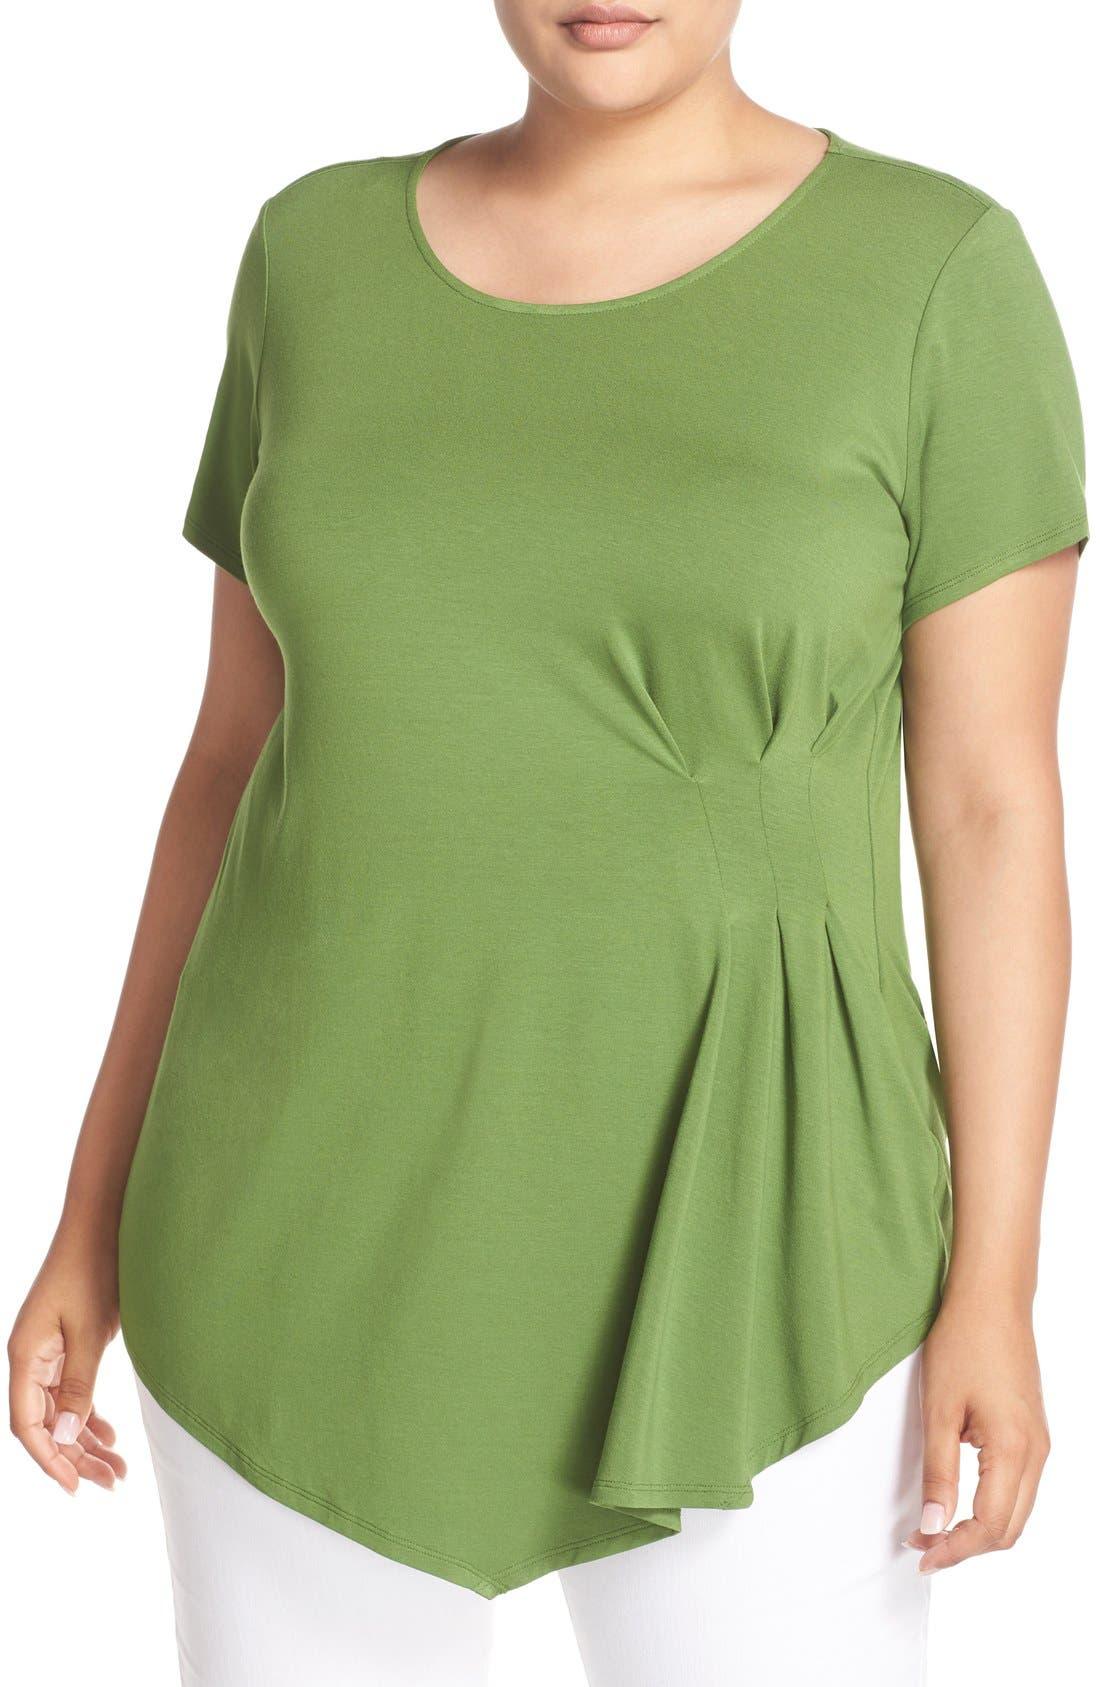 Main Image - Vince Camuto Short Sleeve Side Pleat Asymmetrical Top (Plus Size)